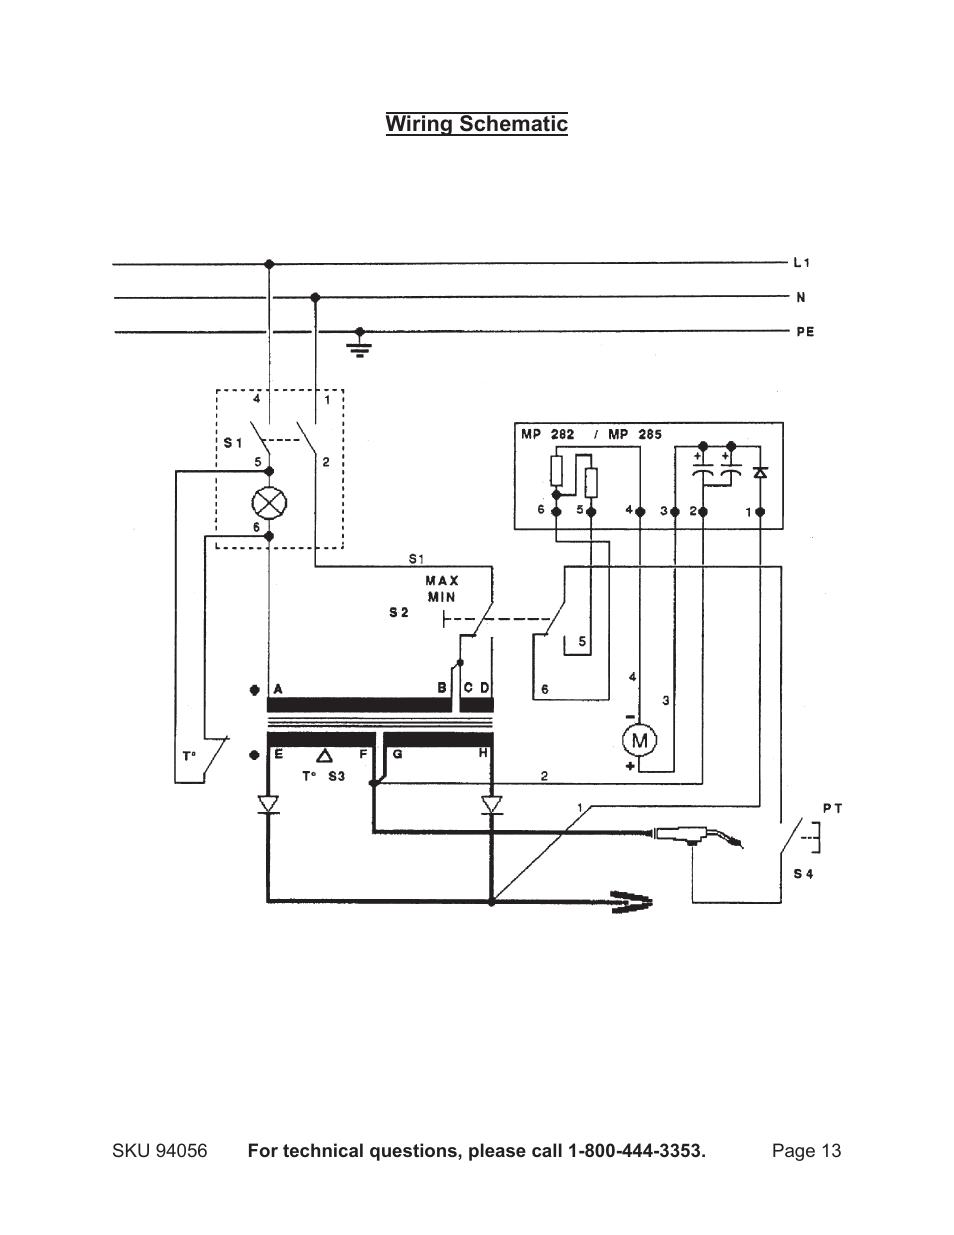 chicago wiring diagram chicago electric mig 100 94056 user manual page 13 14  electric mig 100 94056 user manual